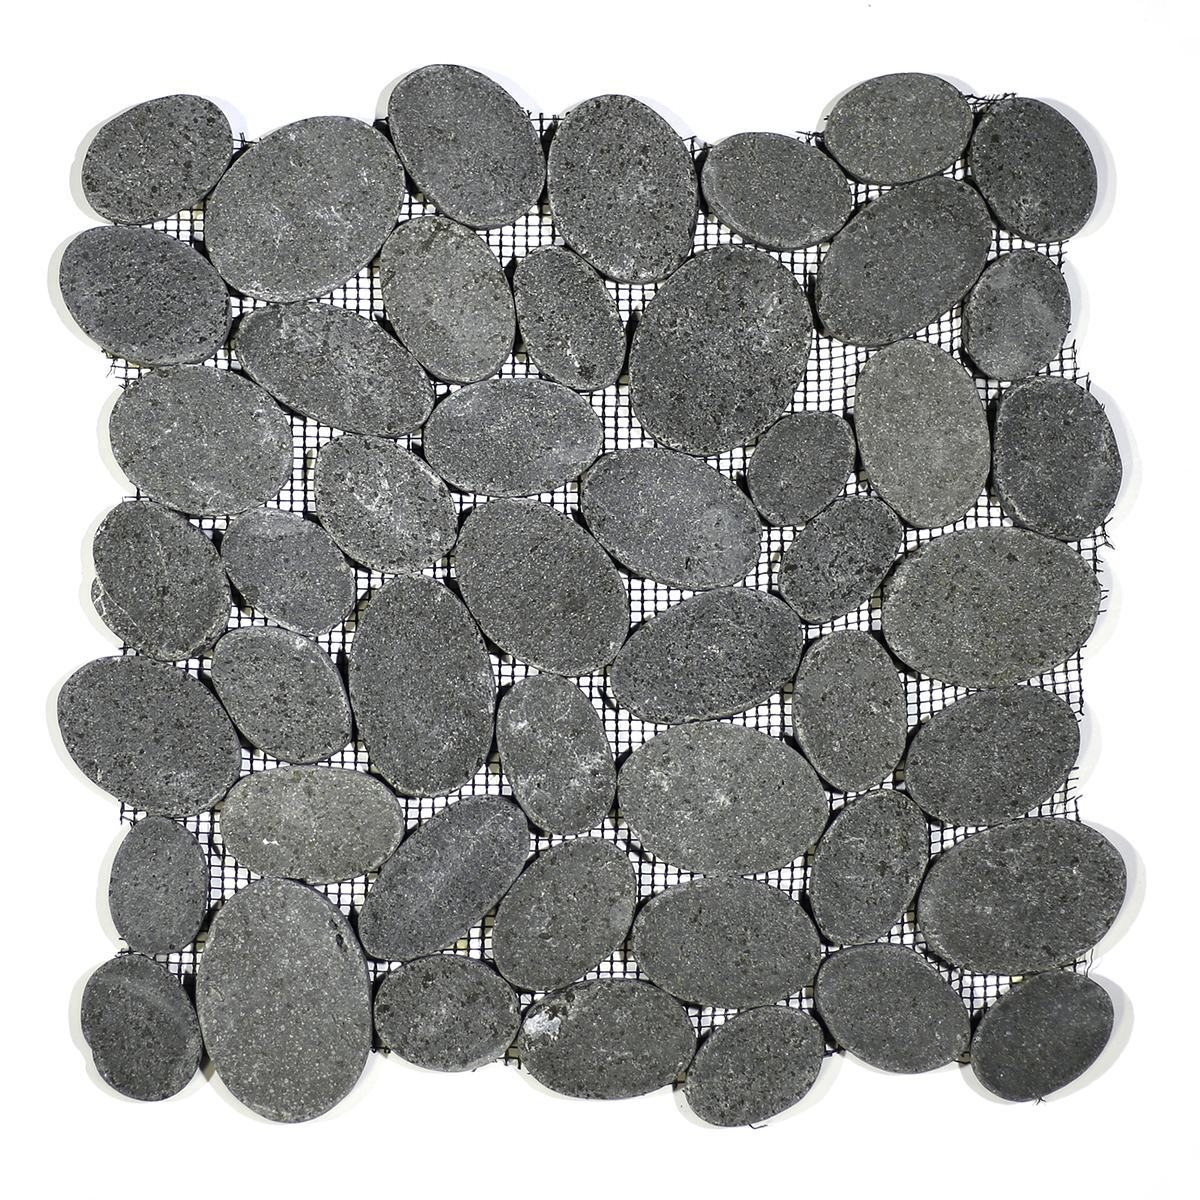 COIN MARBLE TILE BASALT BLACK  TUMBLED STONE PEBBLES